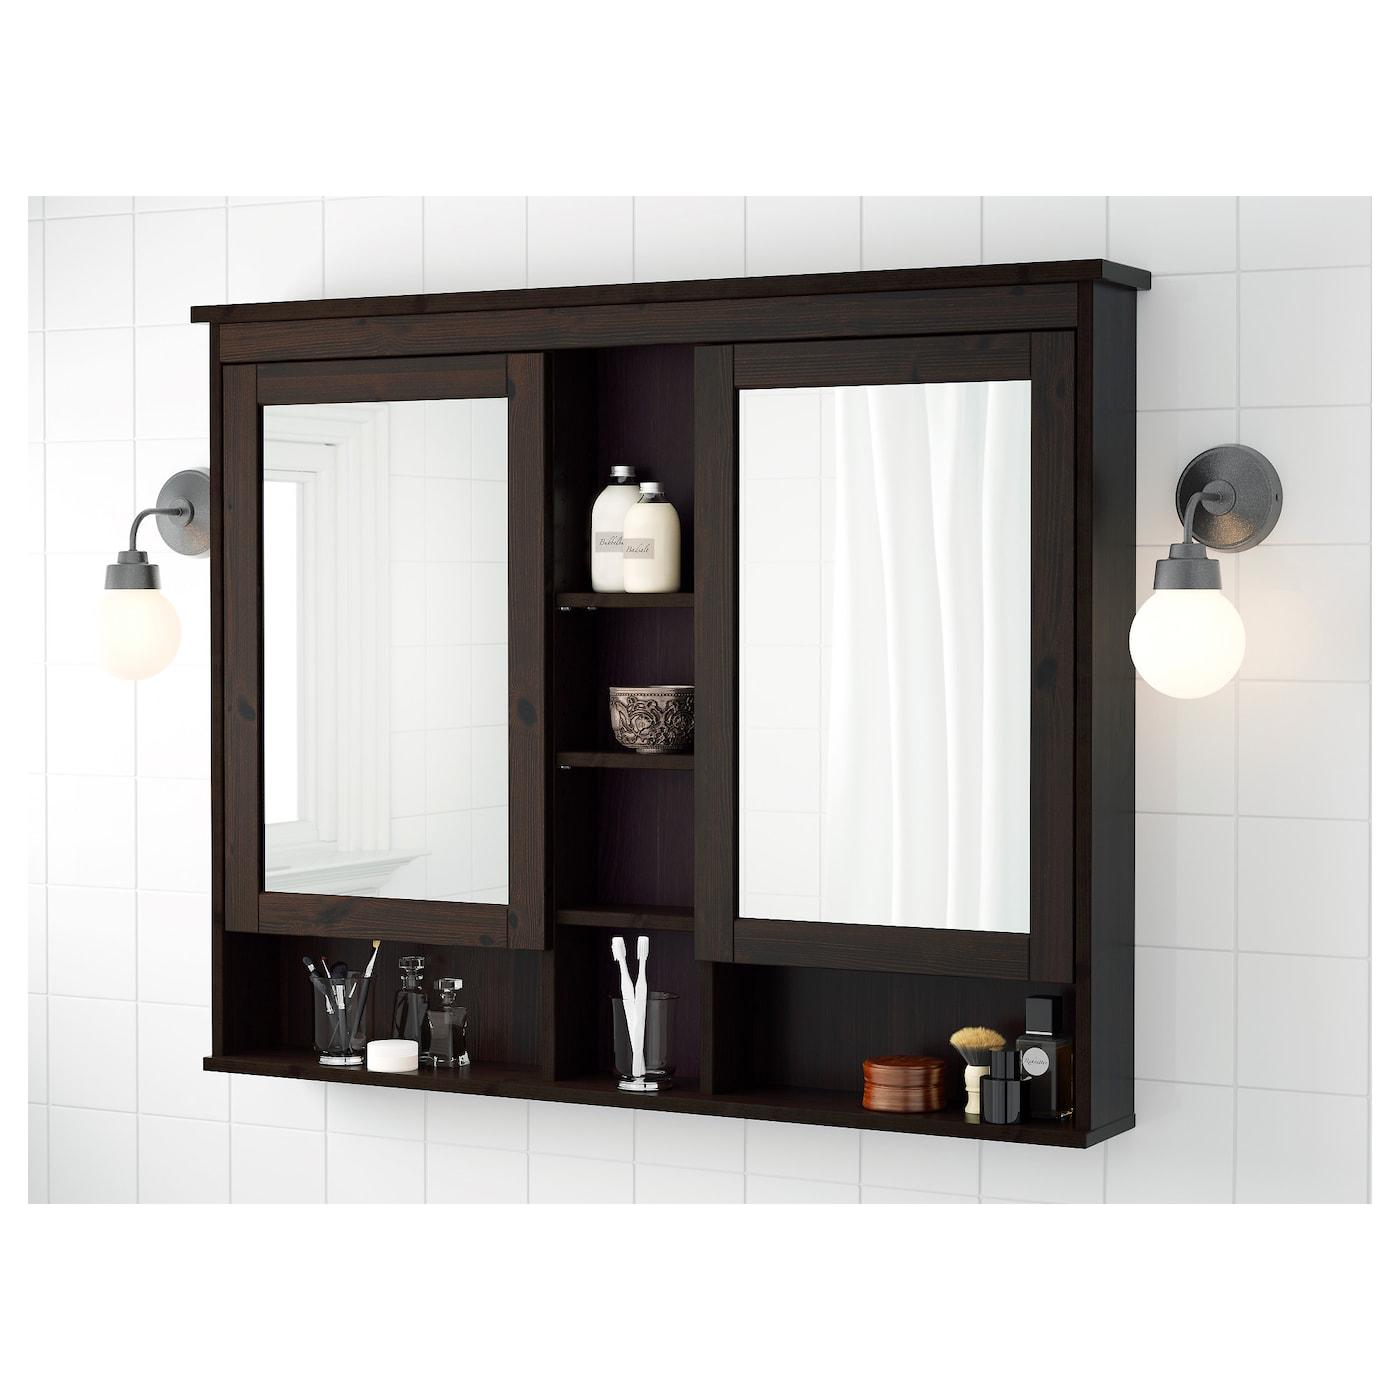 Brilliant Hemnes Mirror Cabinet With 2 Doors Black Brown Stain Interior Design Ideas Gentotryabchikinfo